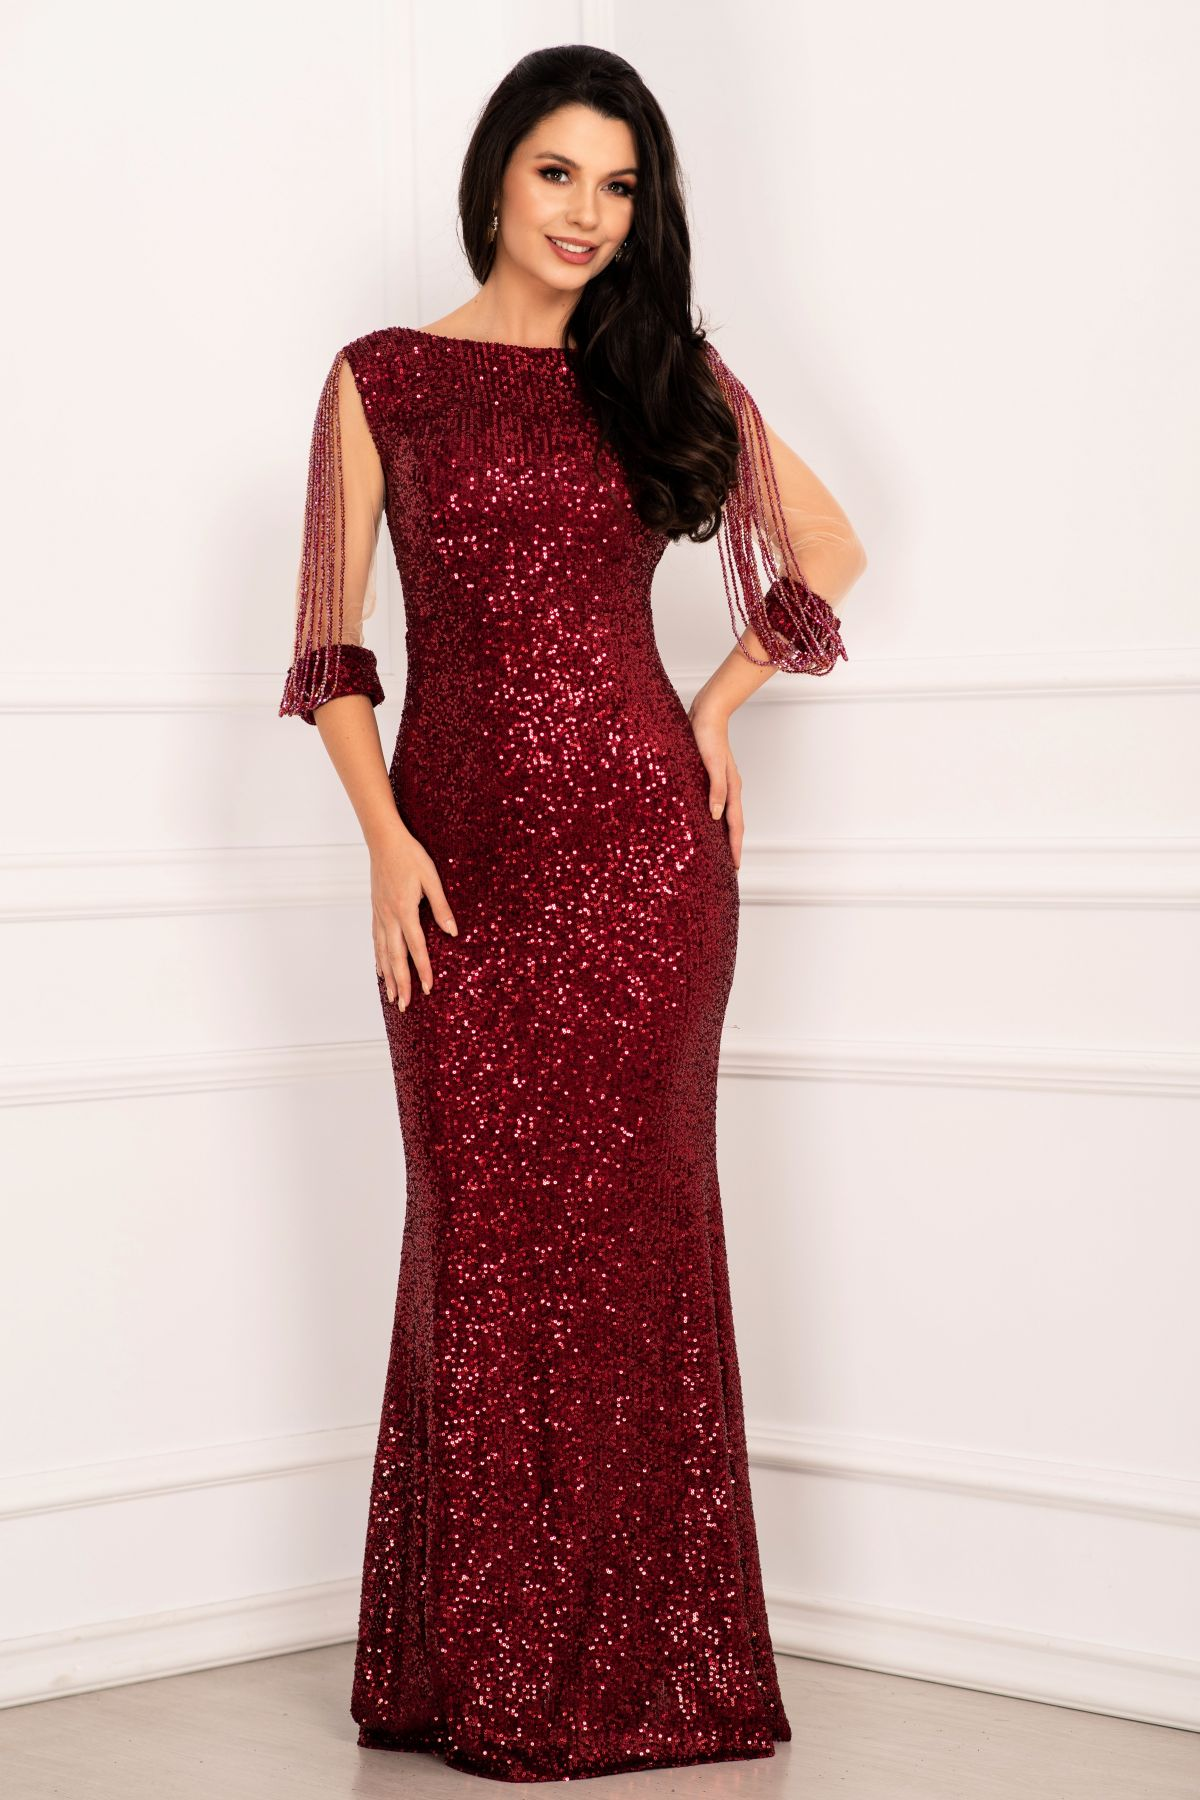 Rochie de seara eleganta din paiete tip sirena bordo cu margele pe maneci